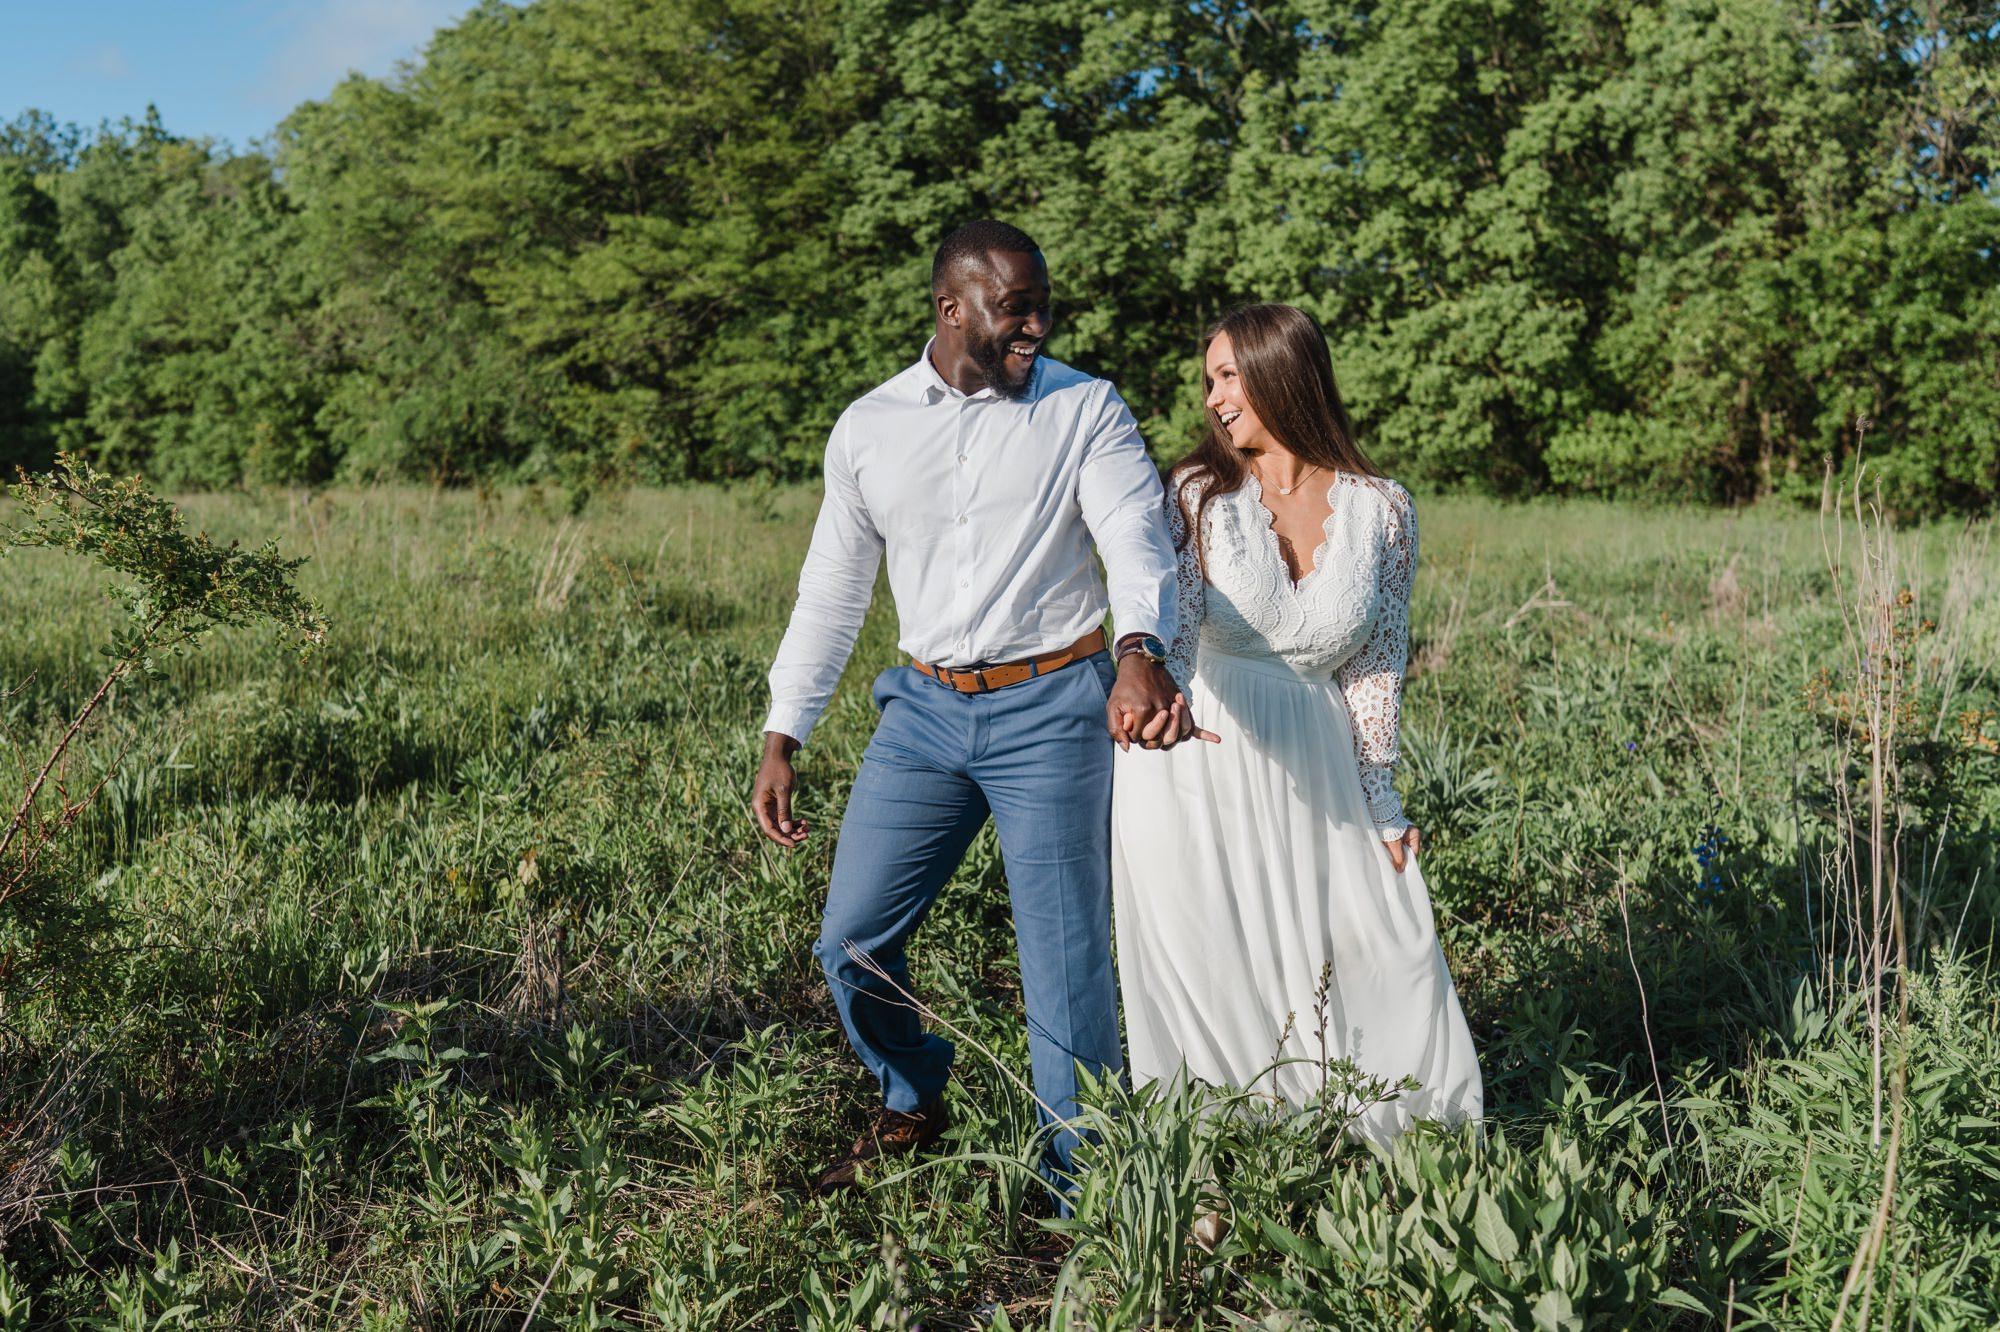 couple walking together in open field at burr oak woods